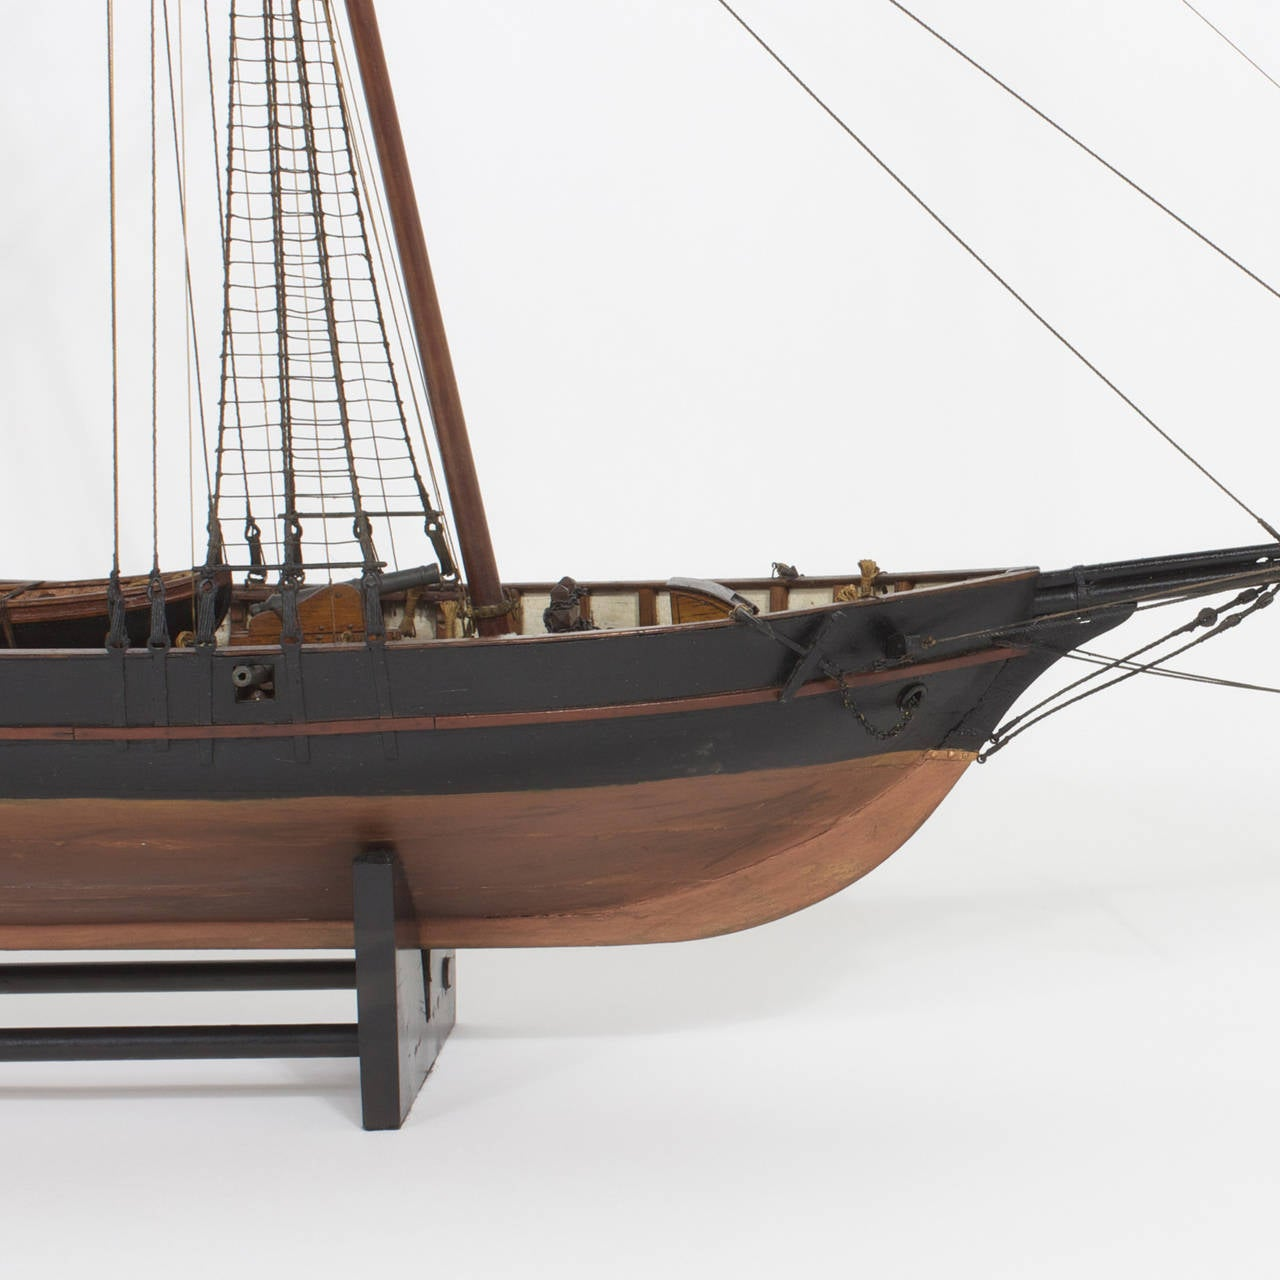 British Colonial Mahogany Schooner Ship or Boat Model For Sale